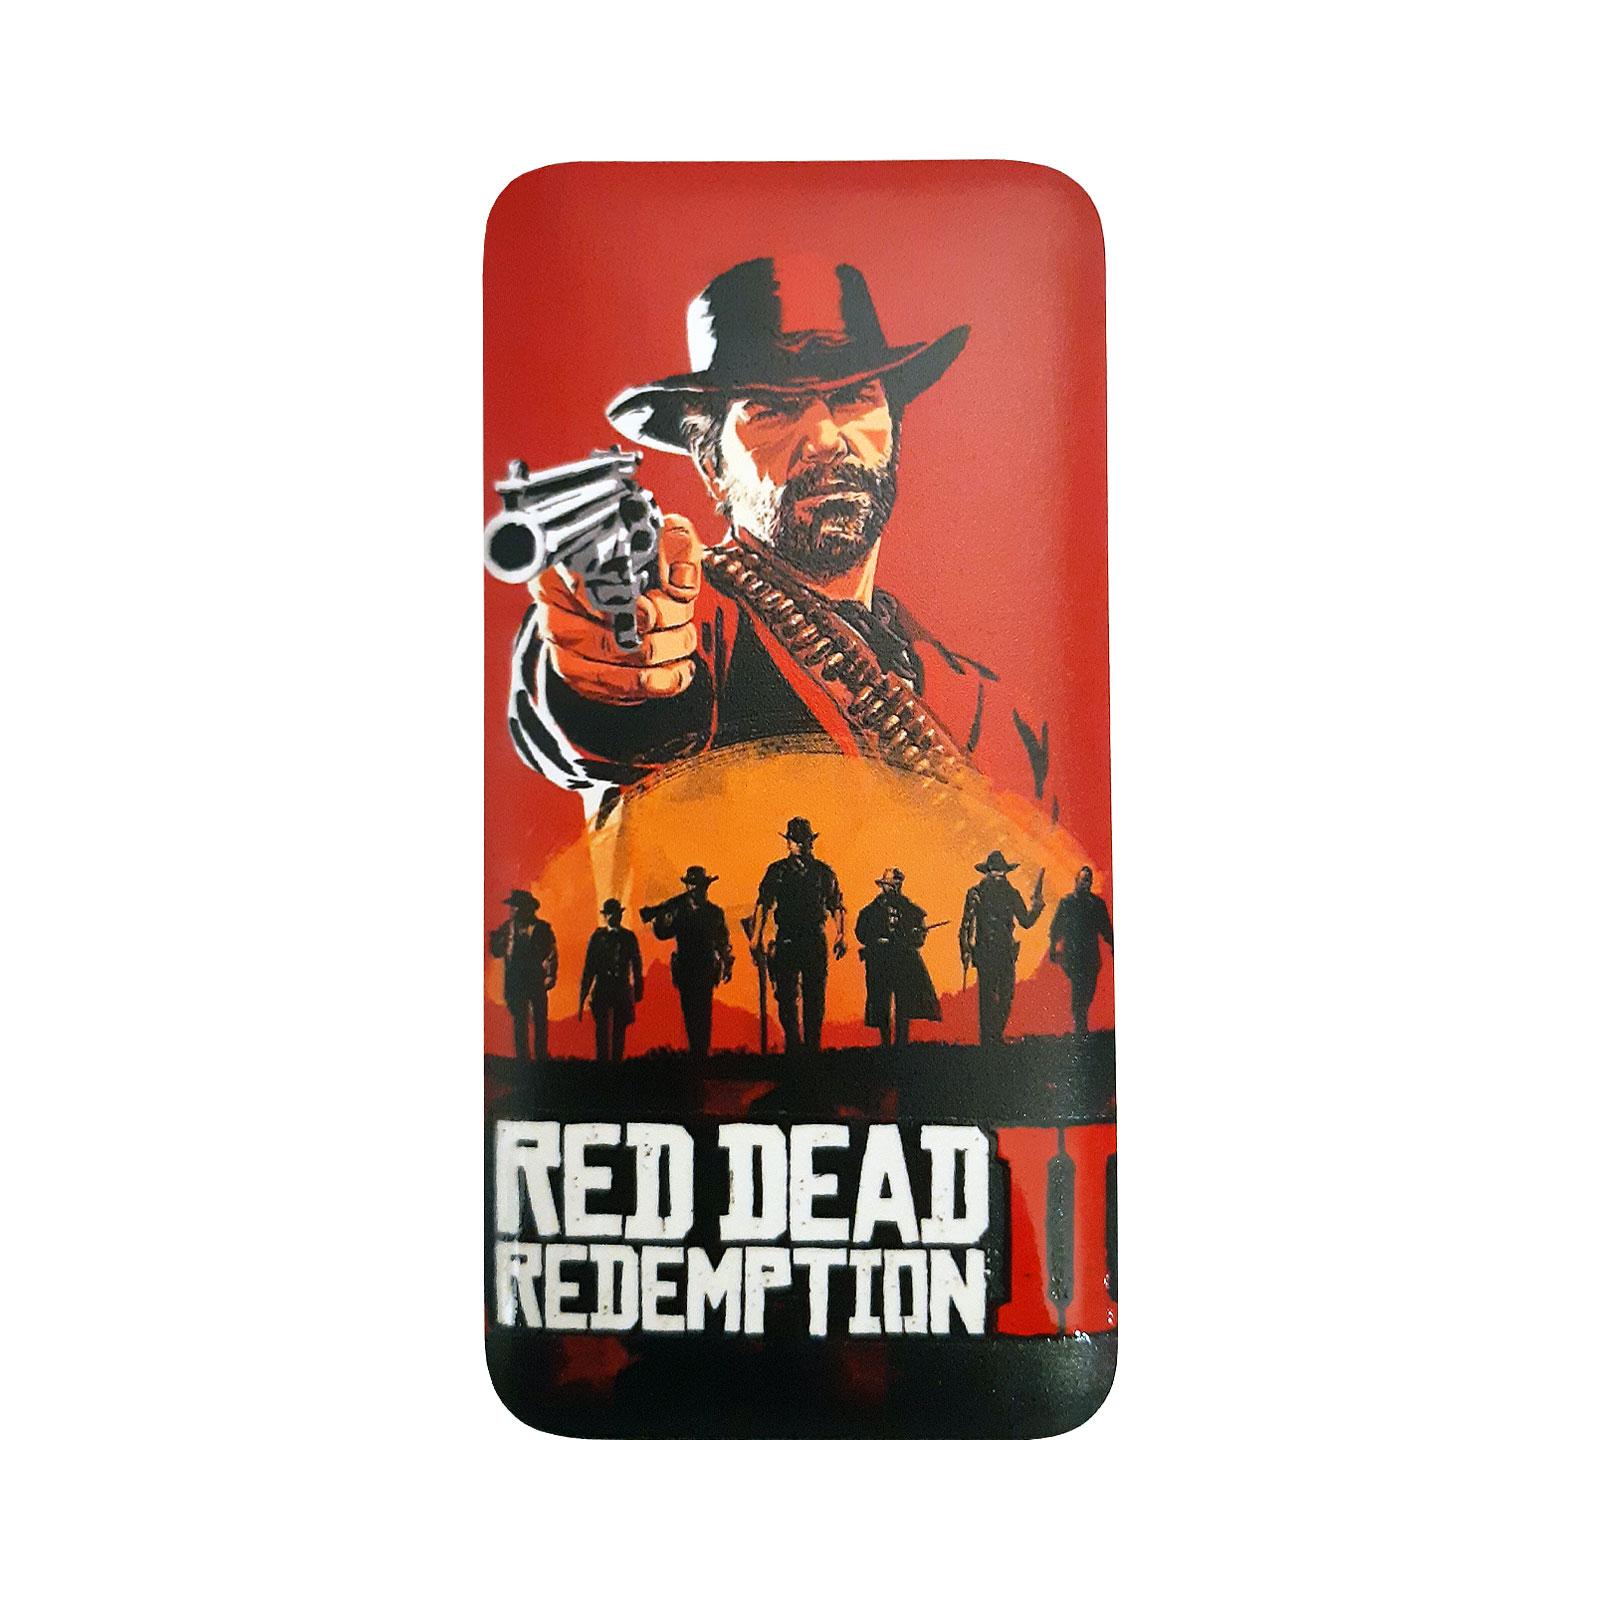 شارژر همراه NK Design  مدل Red Dead 2 ظرفیت 6800 میلی آمپر ساعت